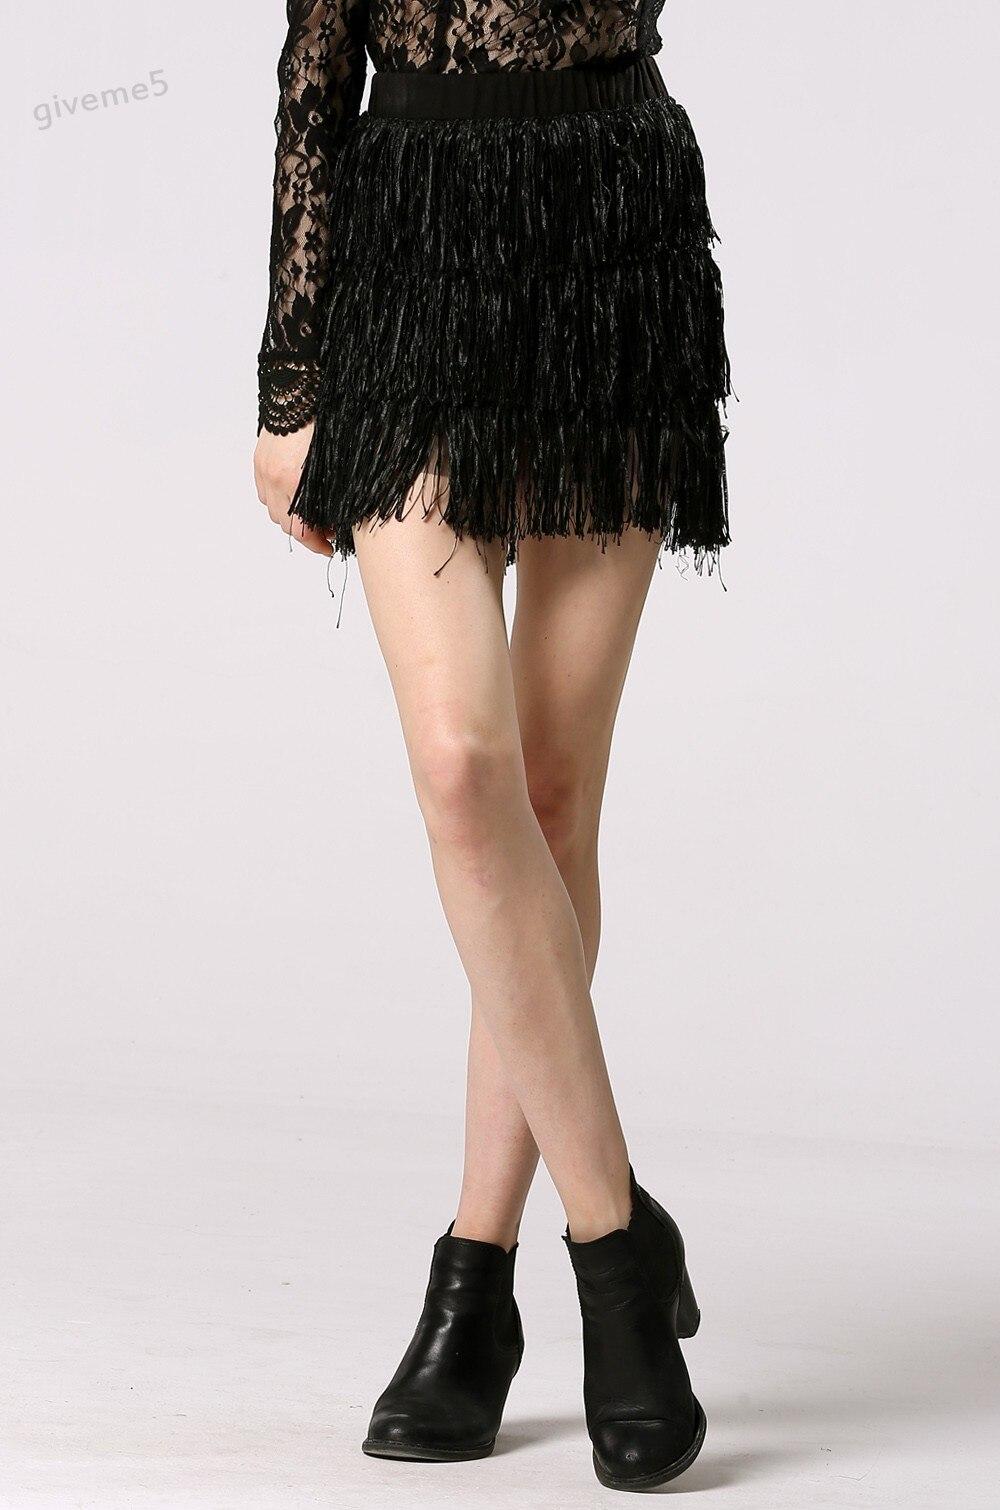 780d3fb65 Fashion Women CLothing Tassel Decor Skirt Casual Multi-Layer Mini Skirt